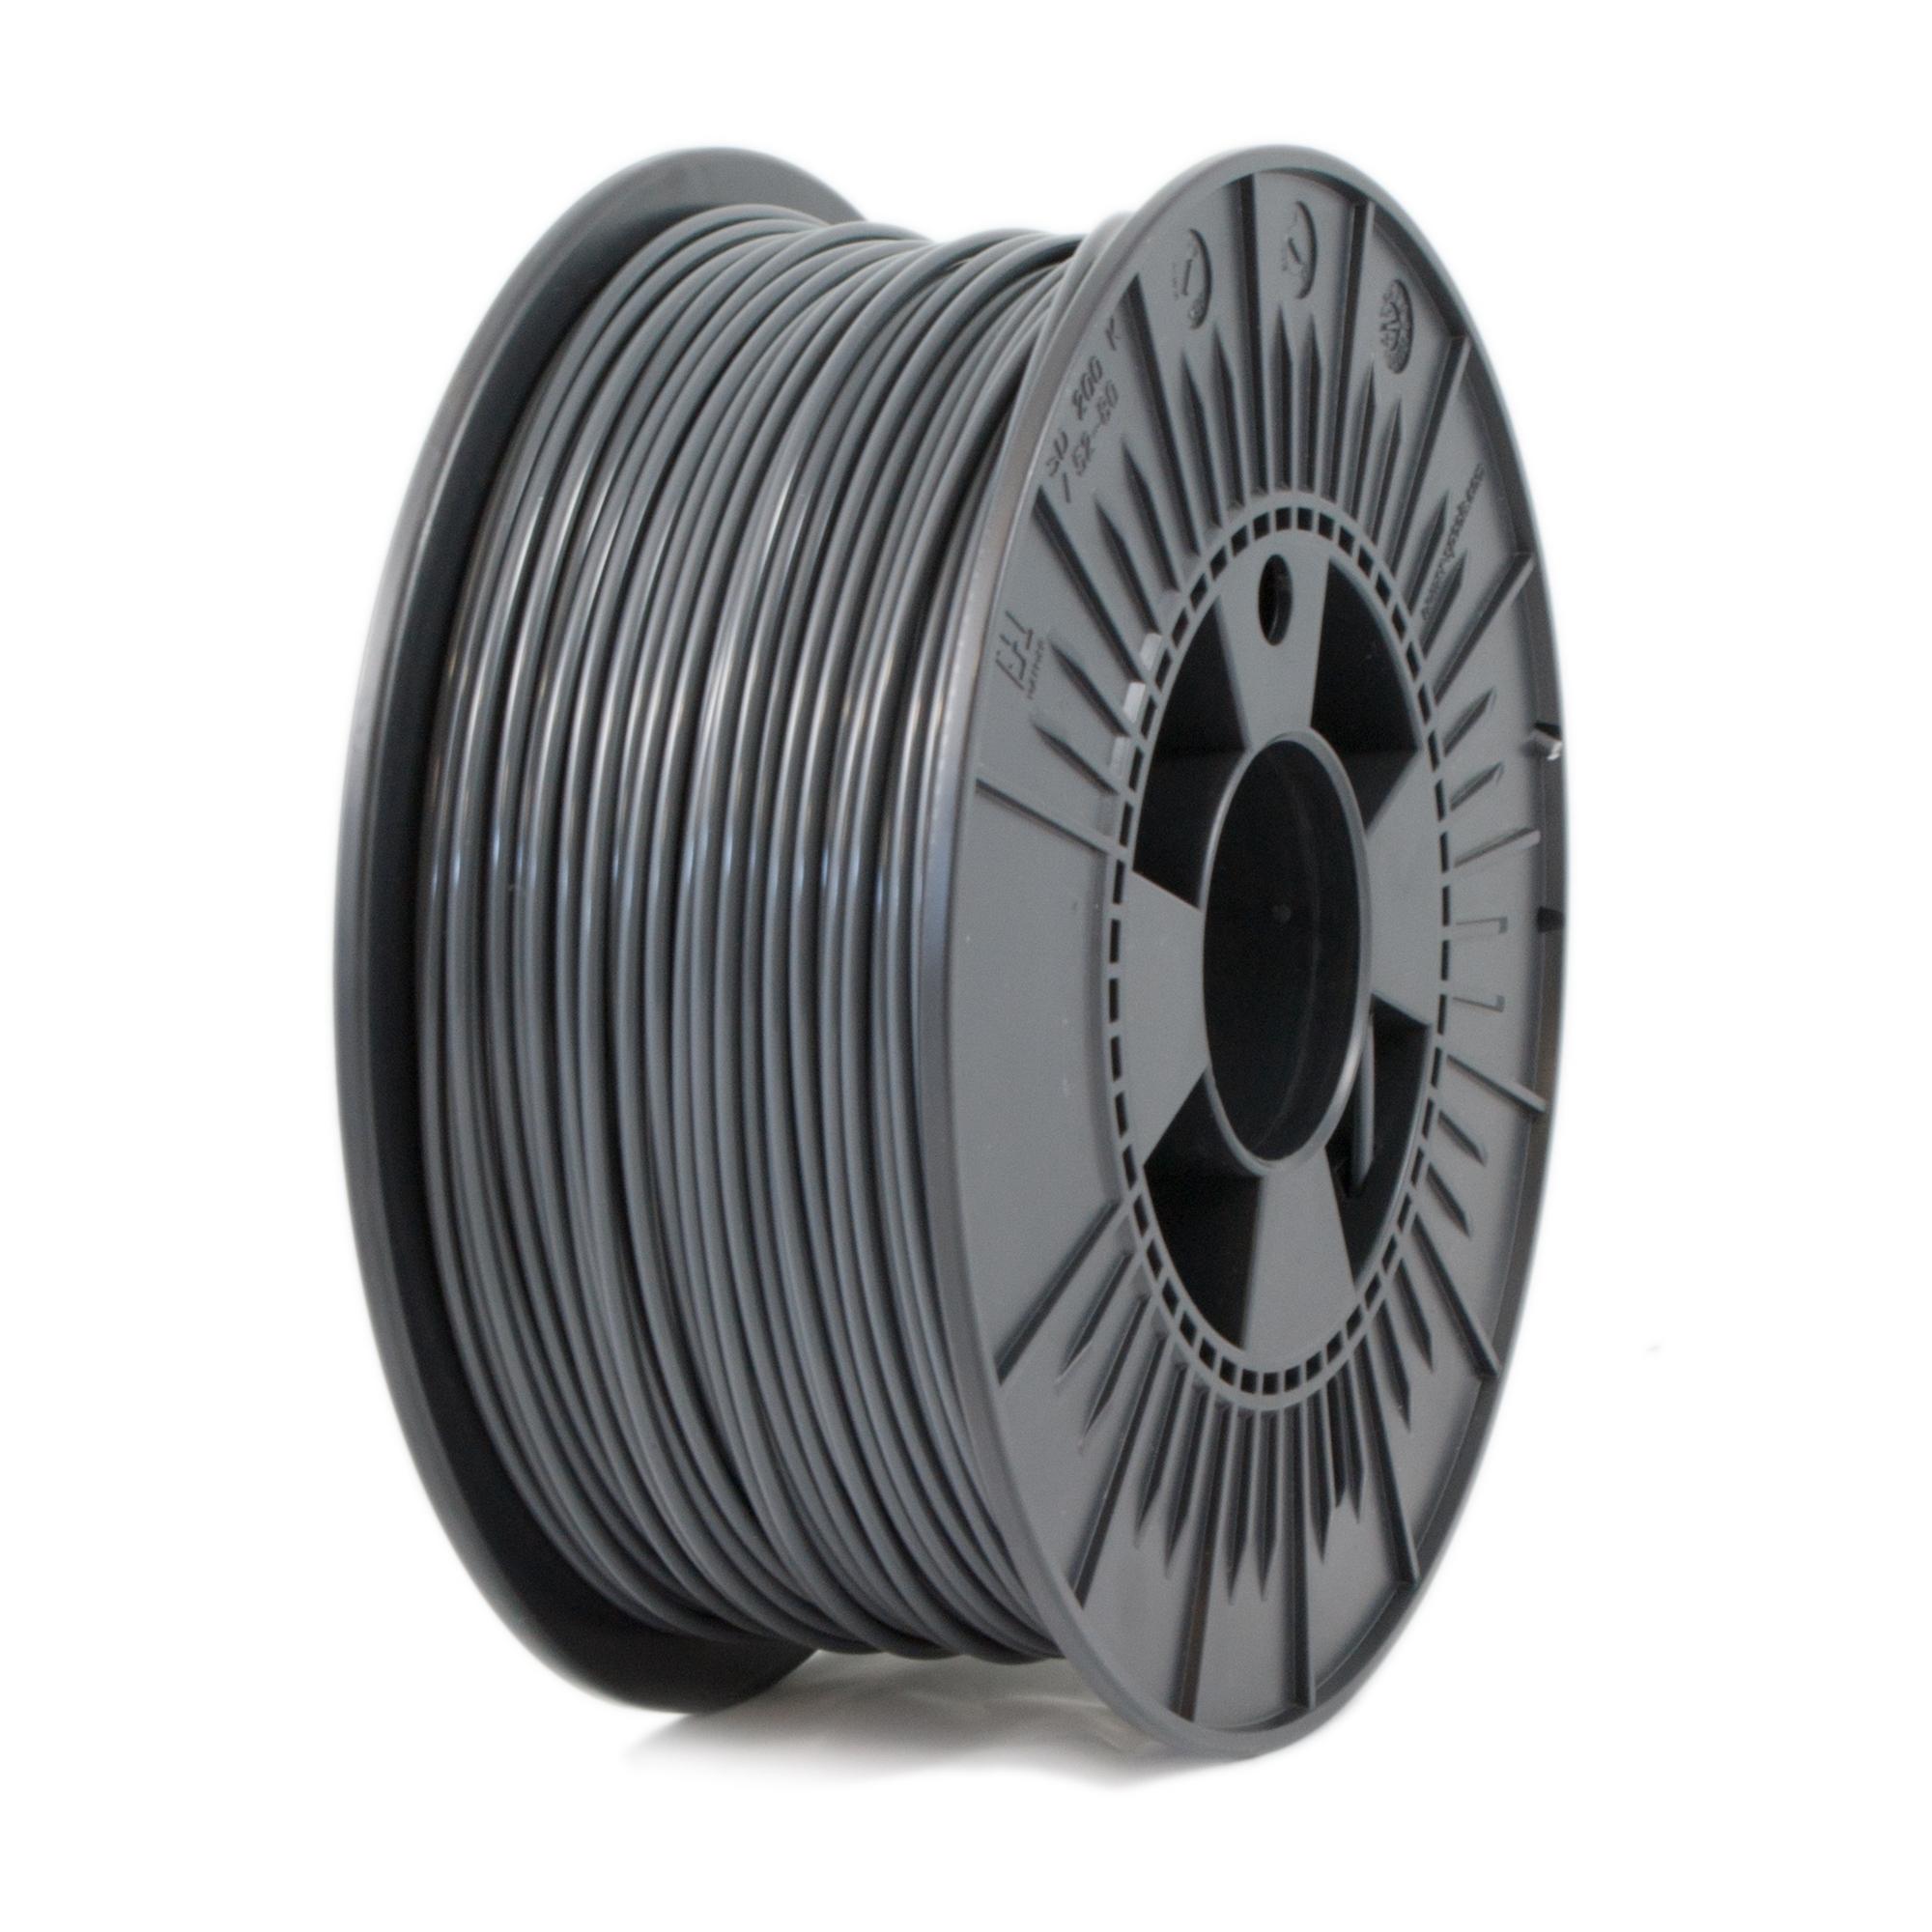 Filamentive  Grey PLA 2.85 mm